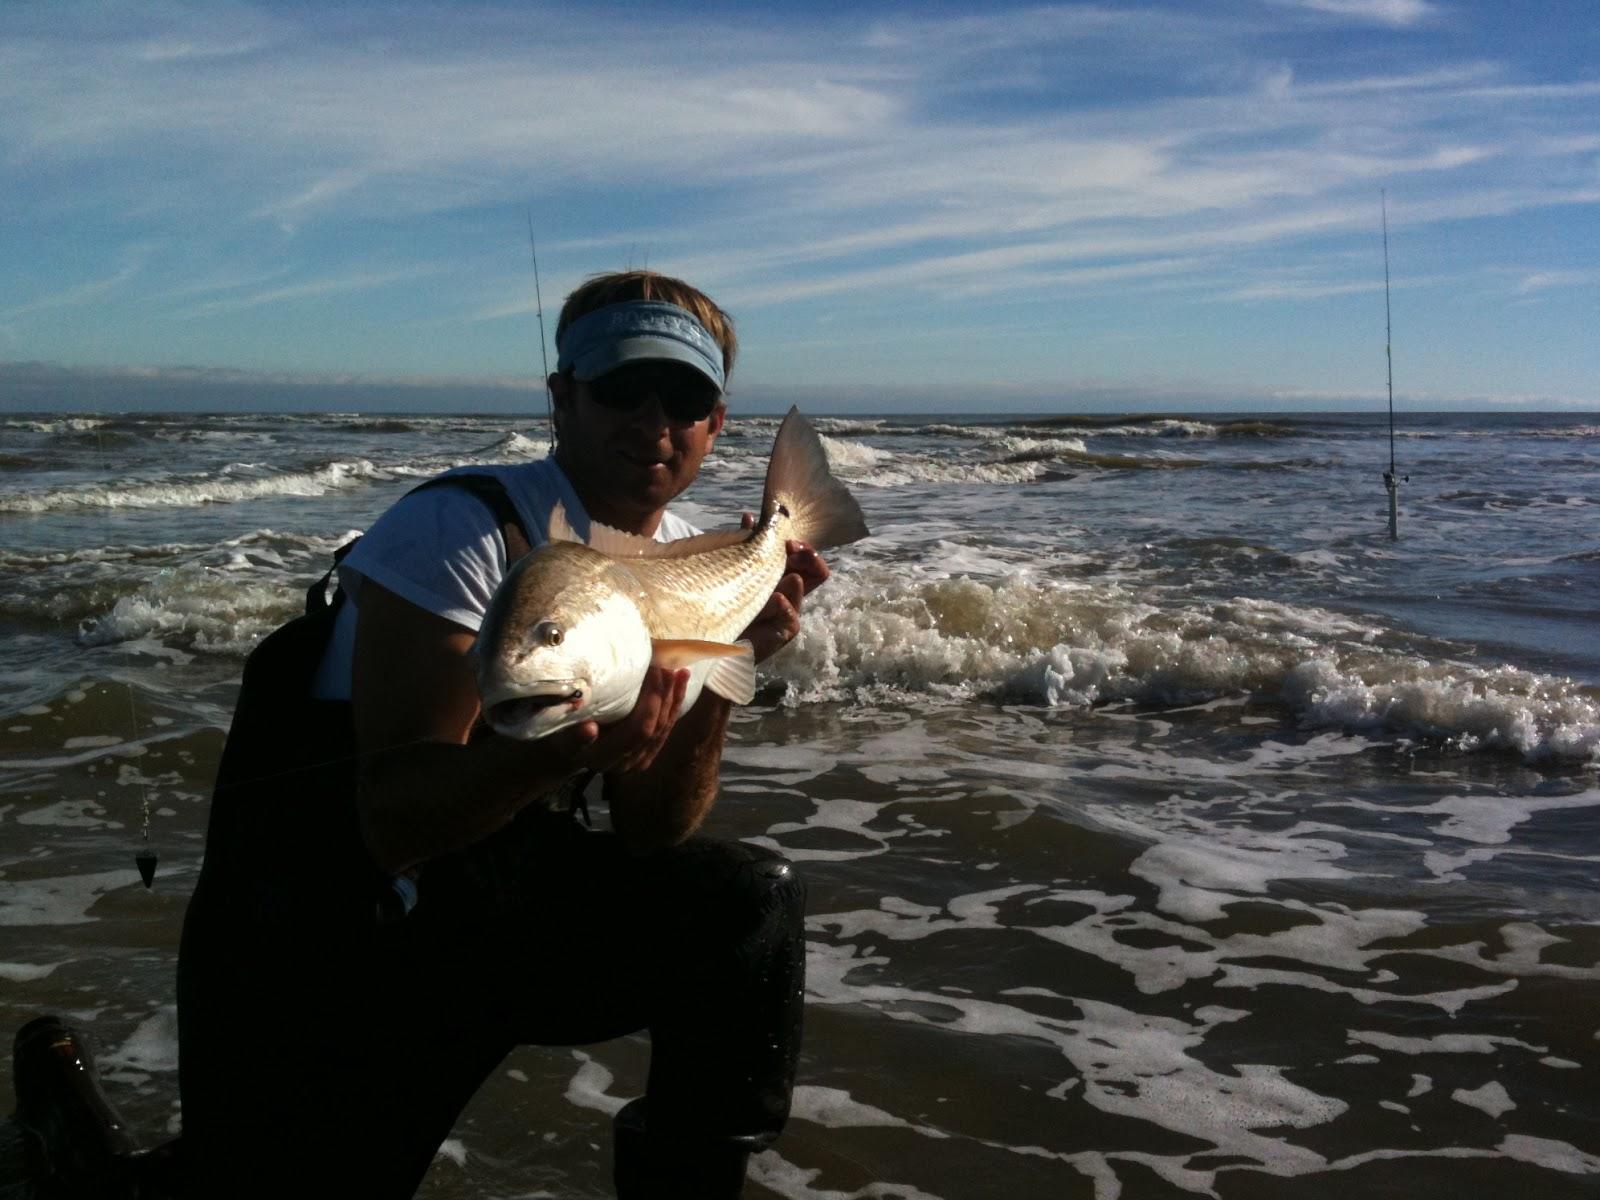 Myrtle beach fishing report surf fishing nov 2012 for Fishing report myrtle beach